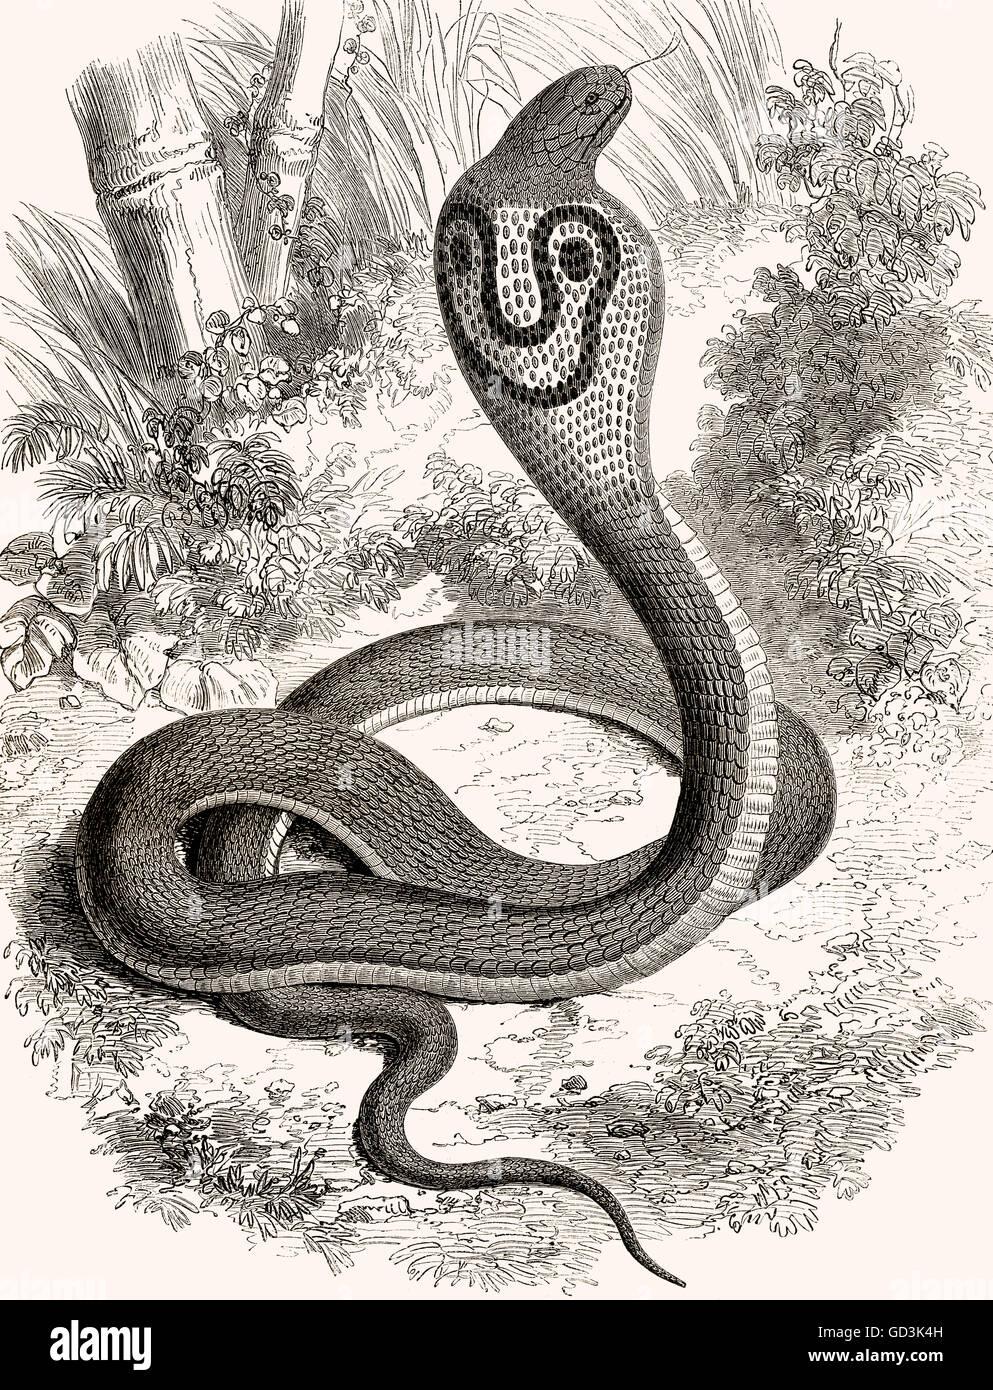 Indian cobra, Oso cobra, cobra Asiática, Naja naja, Brillenschlange, Kobra Südasiatische Foto de stock